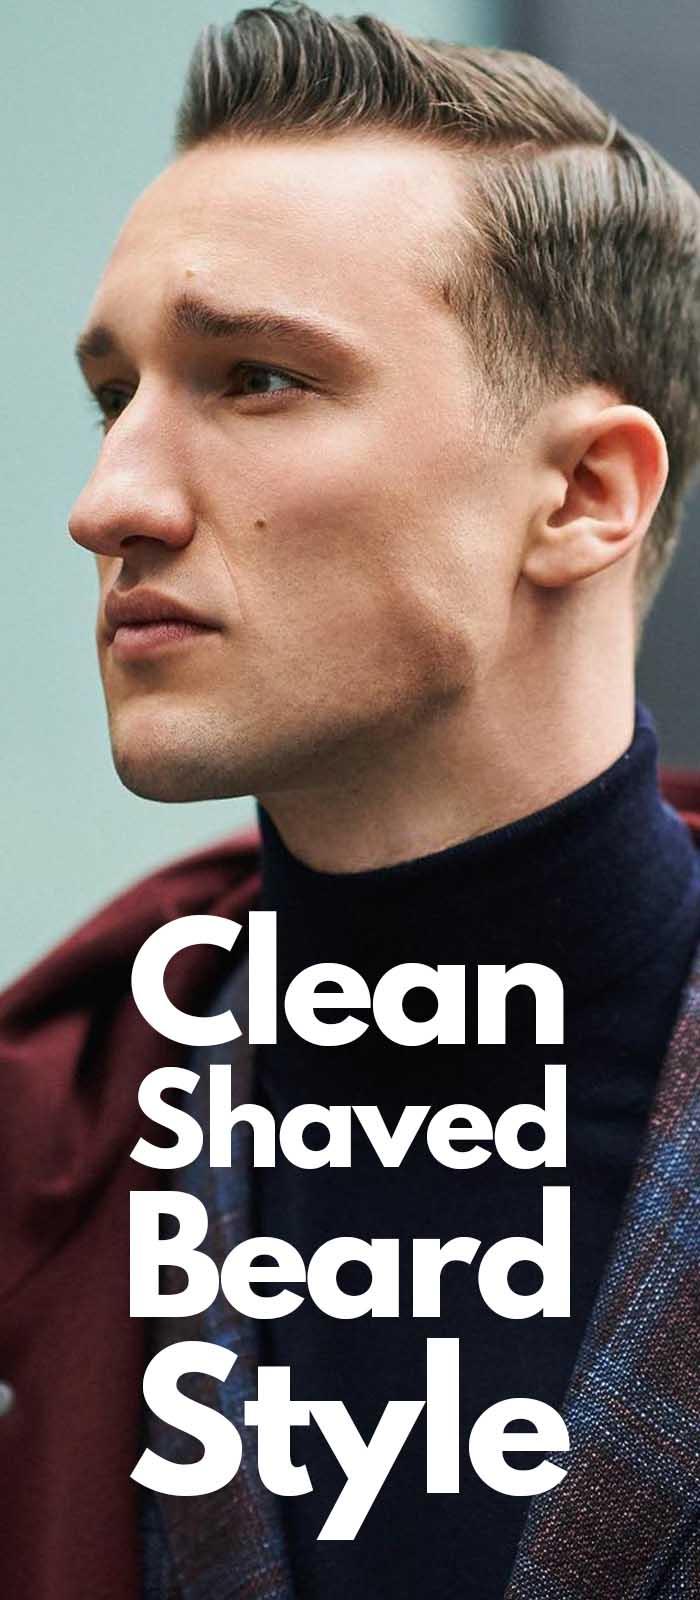 Best Clean Shave beard look for men!